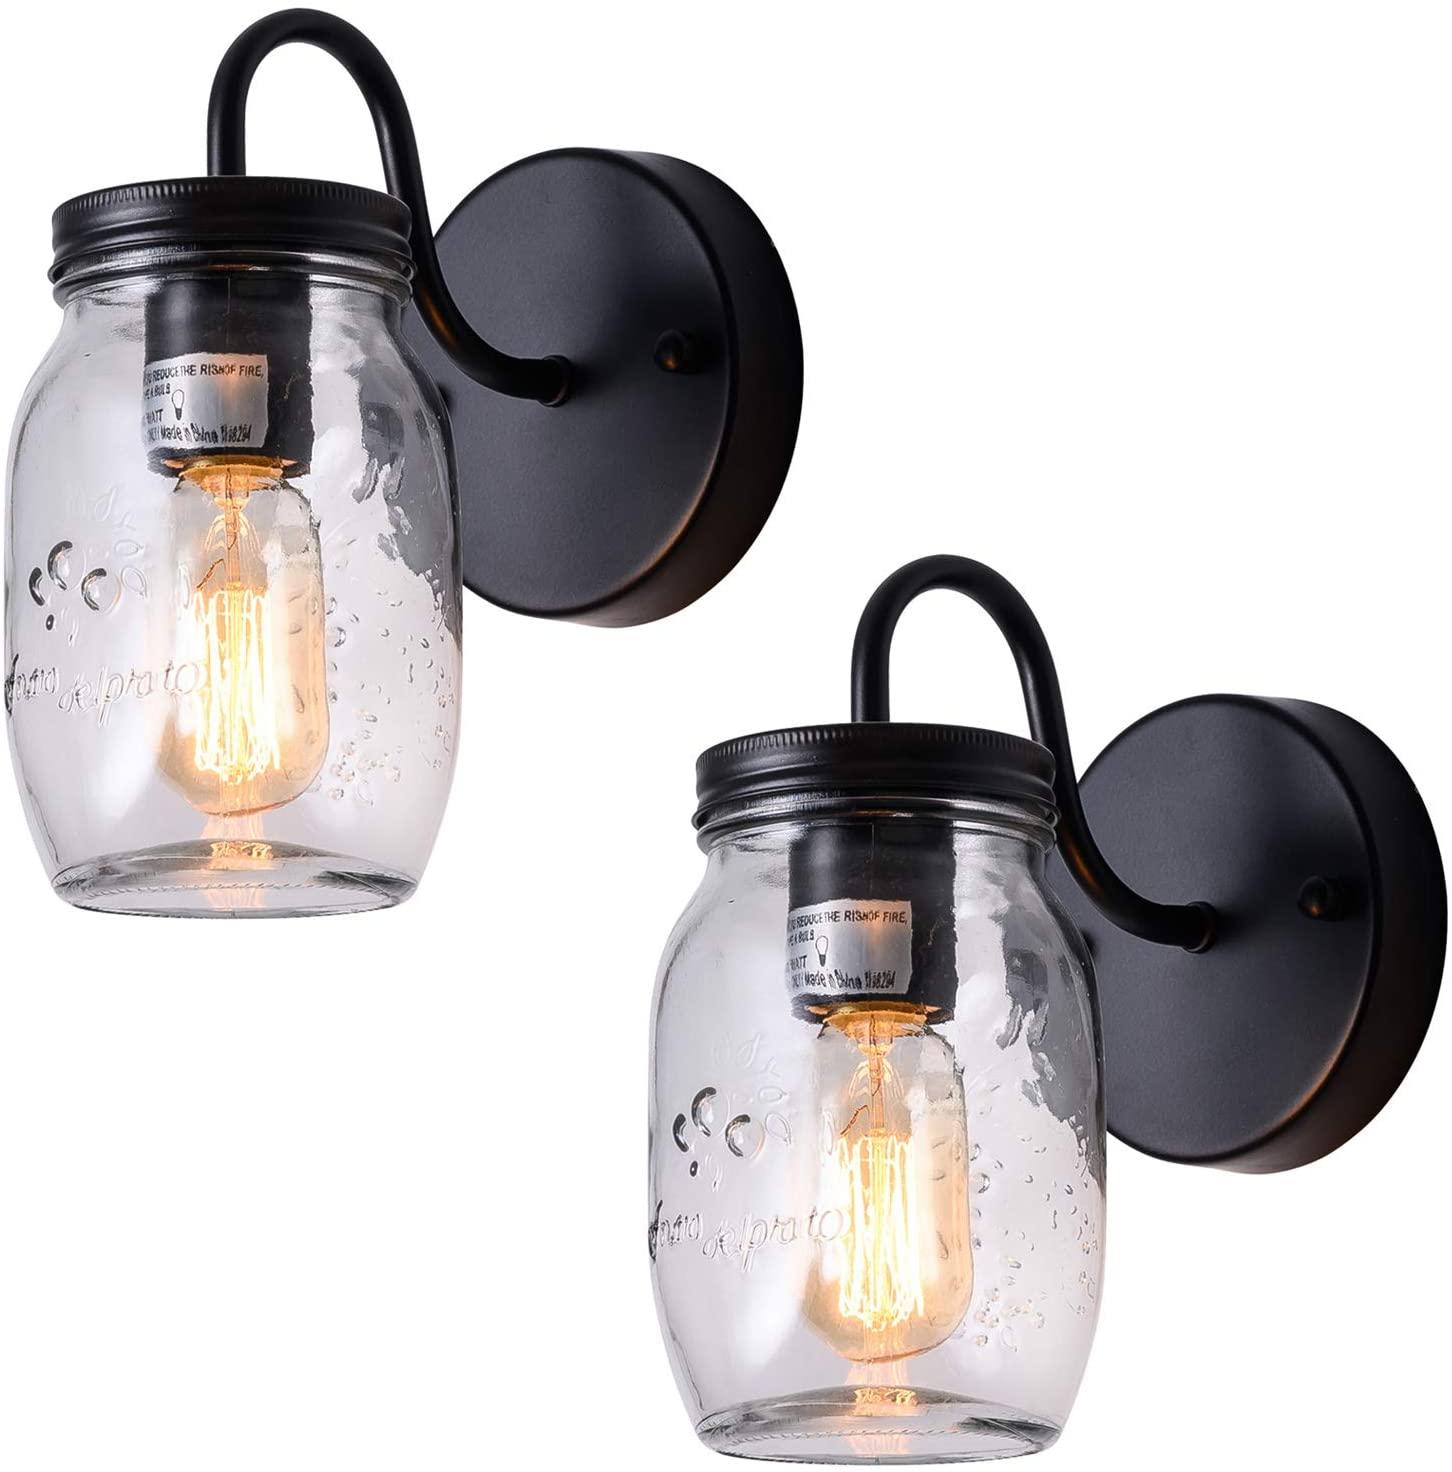 XIPUDA Mason Jar Light Fixture Retro Wall Sconce Farmhouse Hallway Lighting Bathroom Vanity Light (2 Packs)